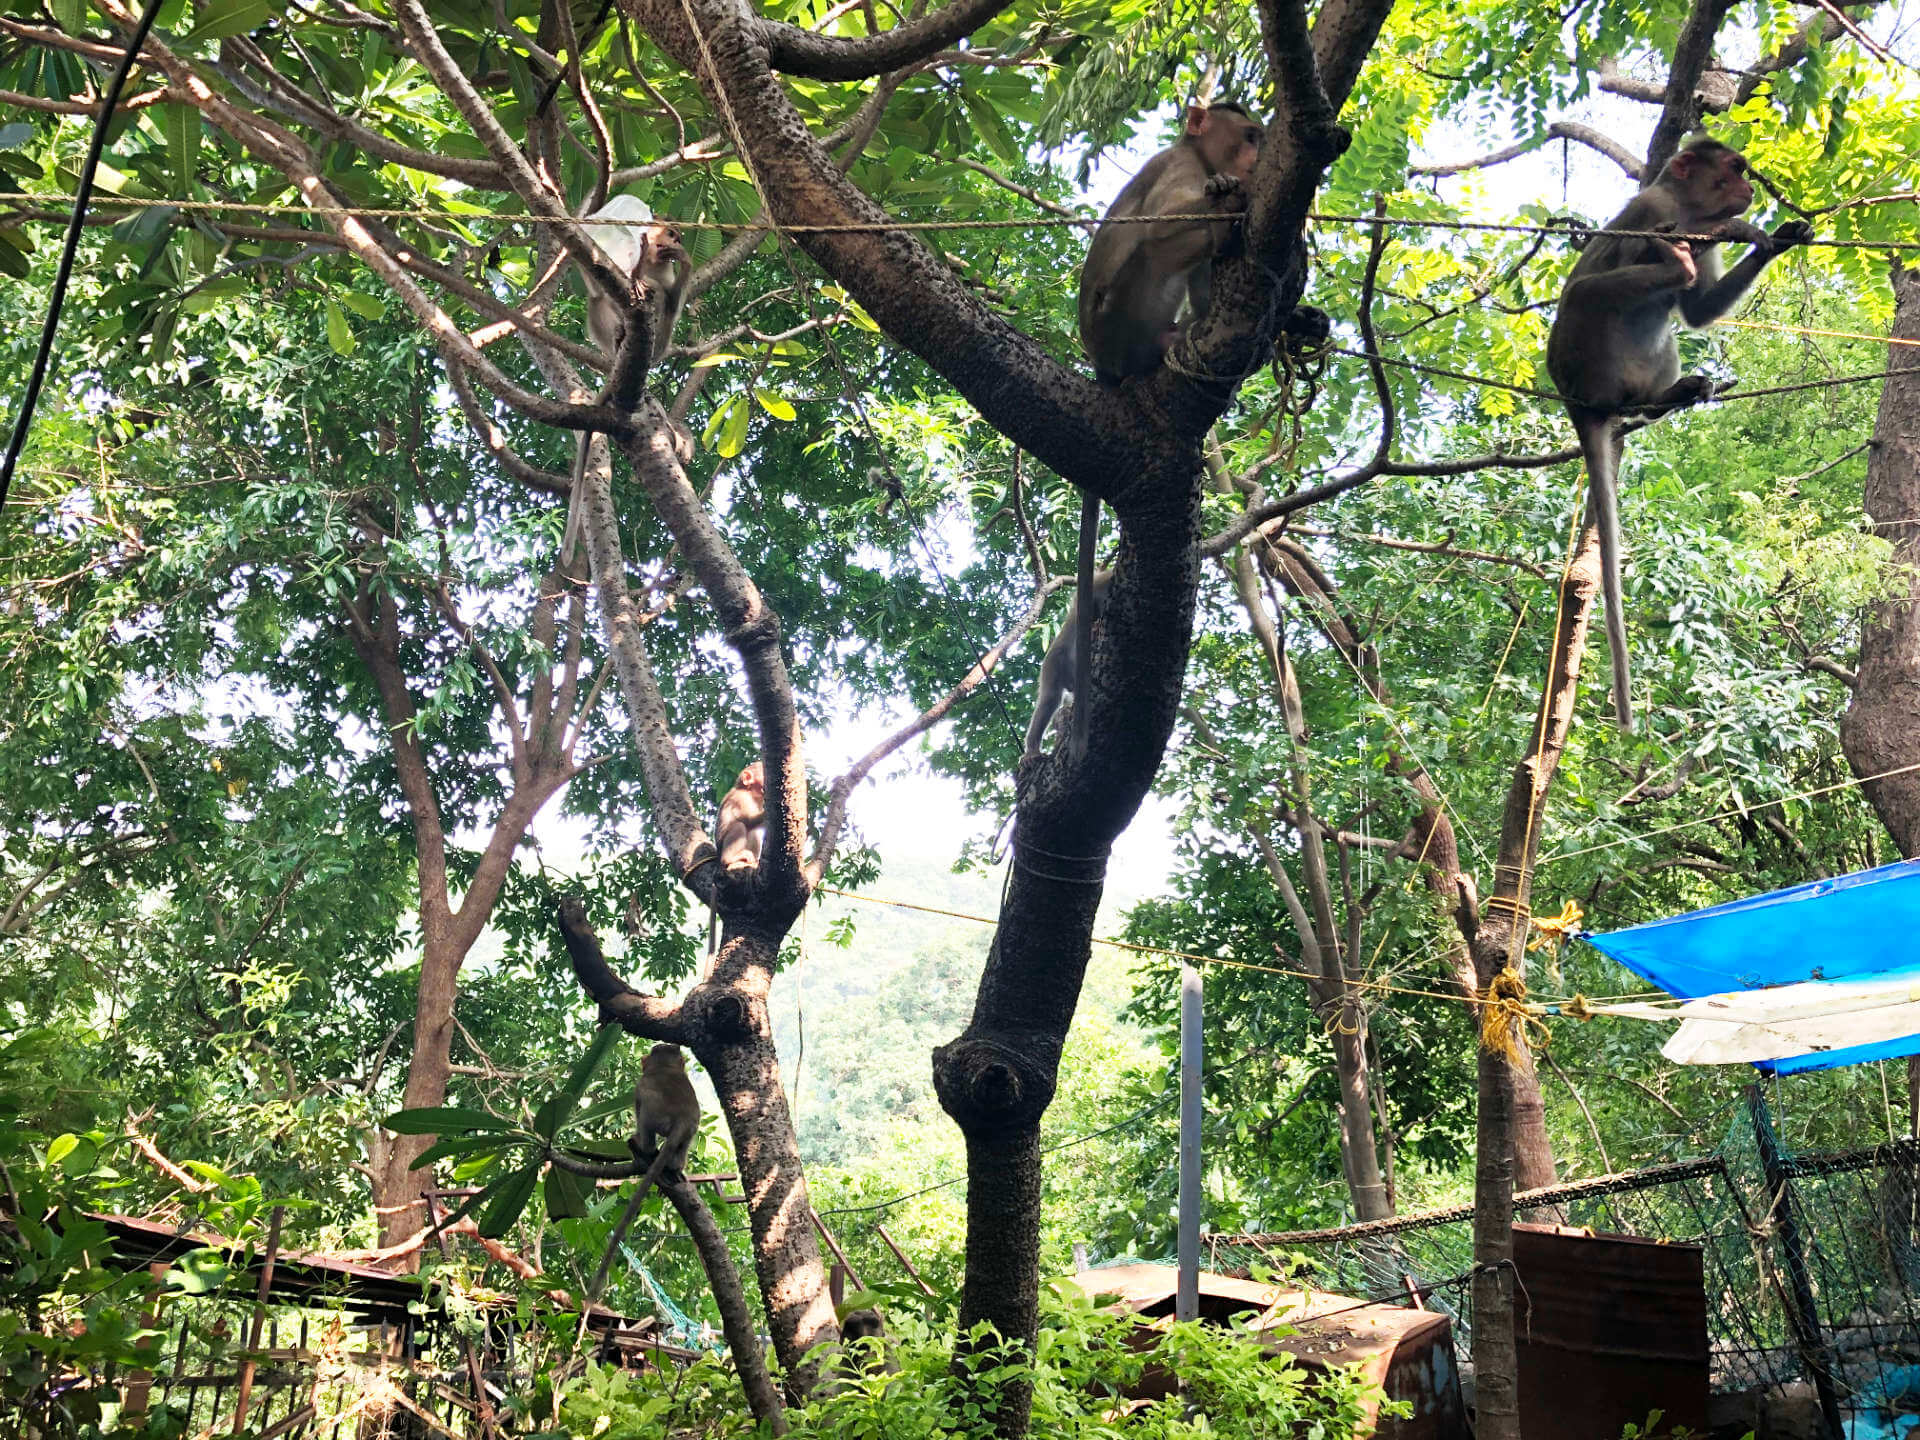 Indien Mumbai Elephanta Island Affen im Baum